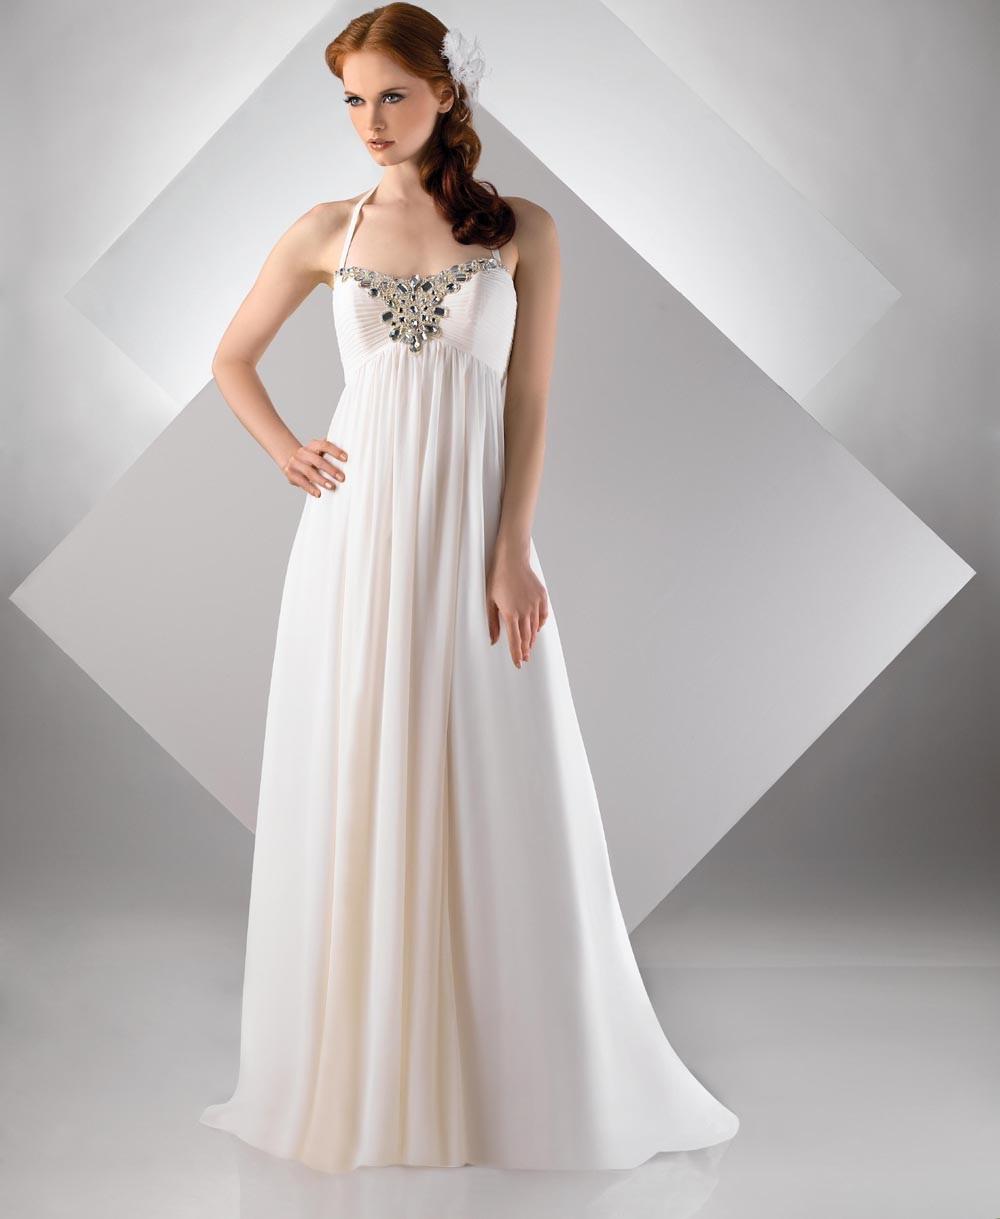 simple casual wedding dress photo - 1